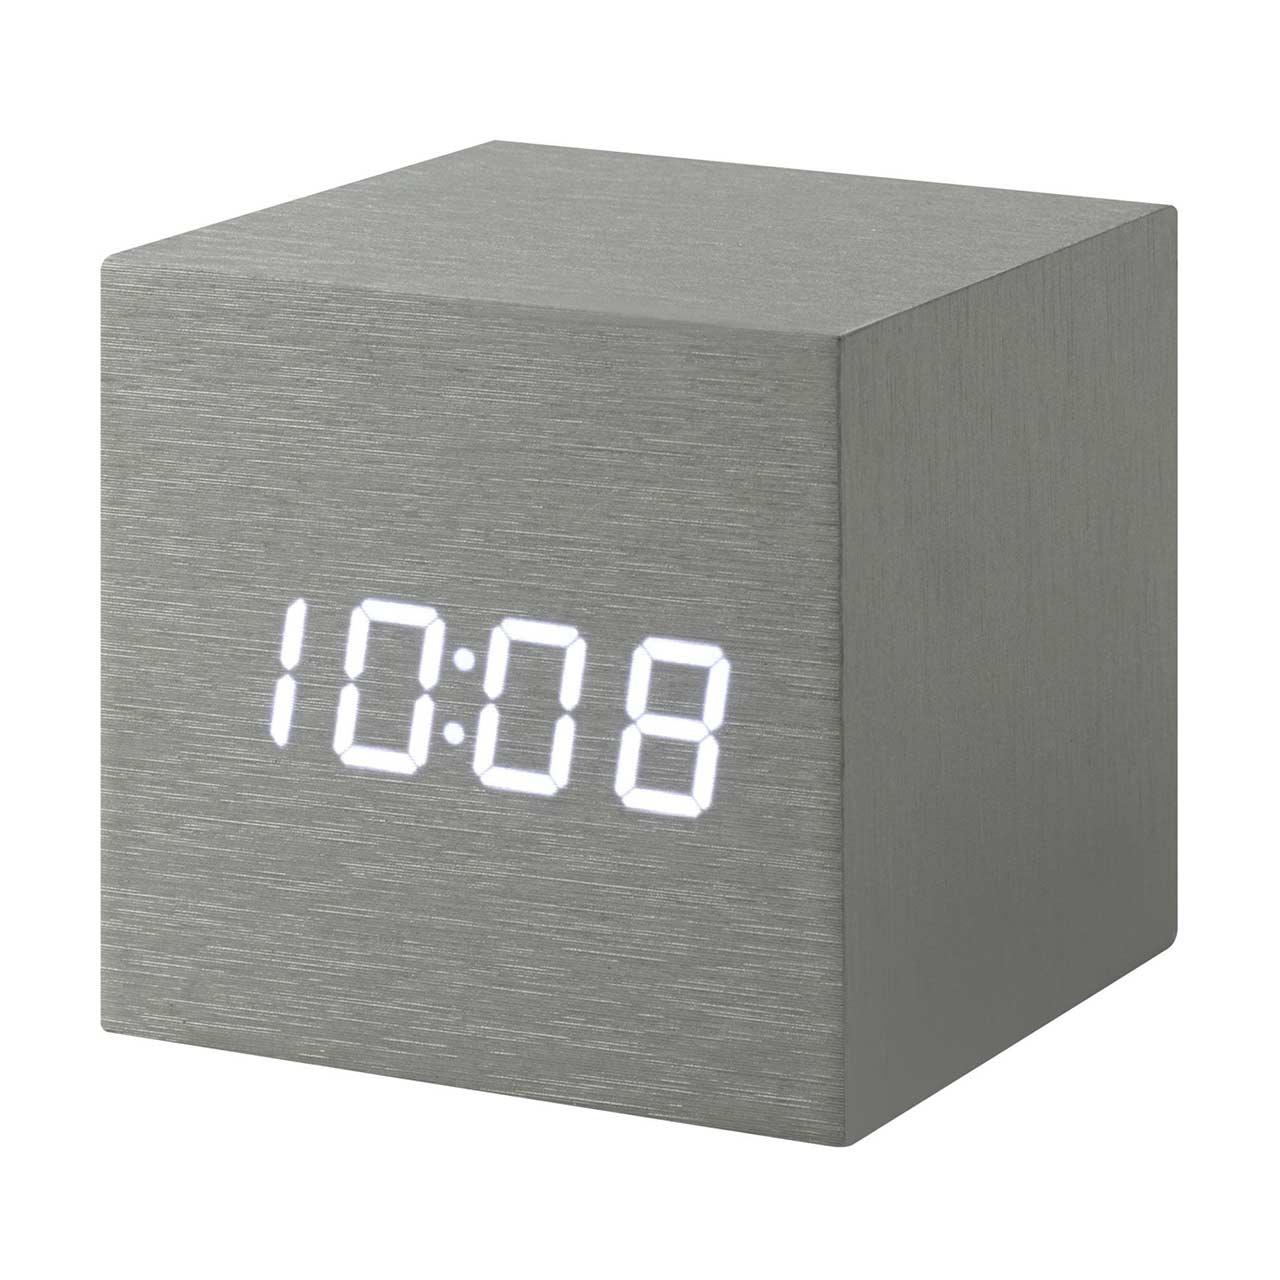 MoMA cube click clock Alume / white LED | the design gift shop